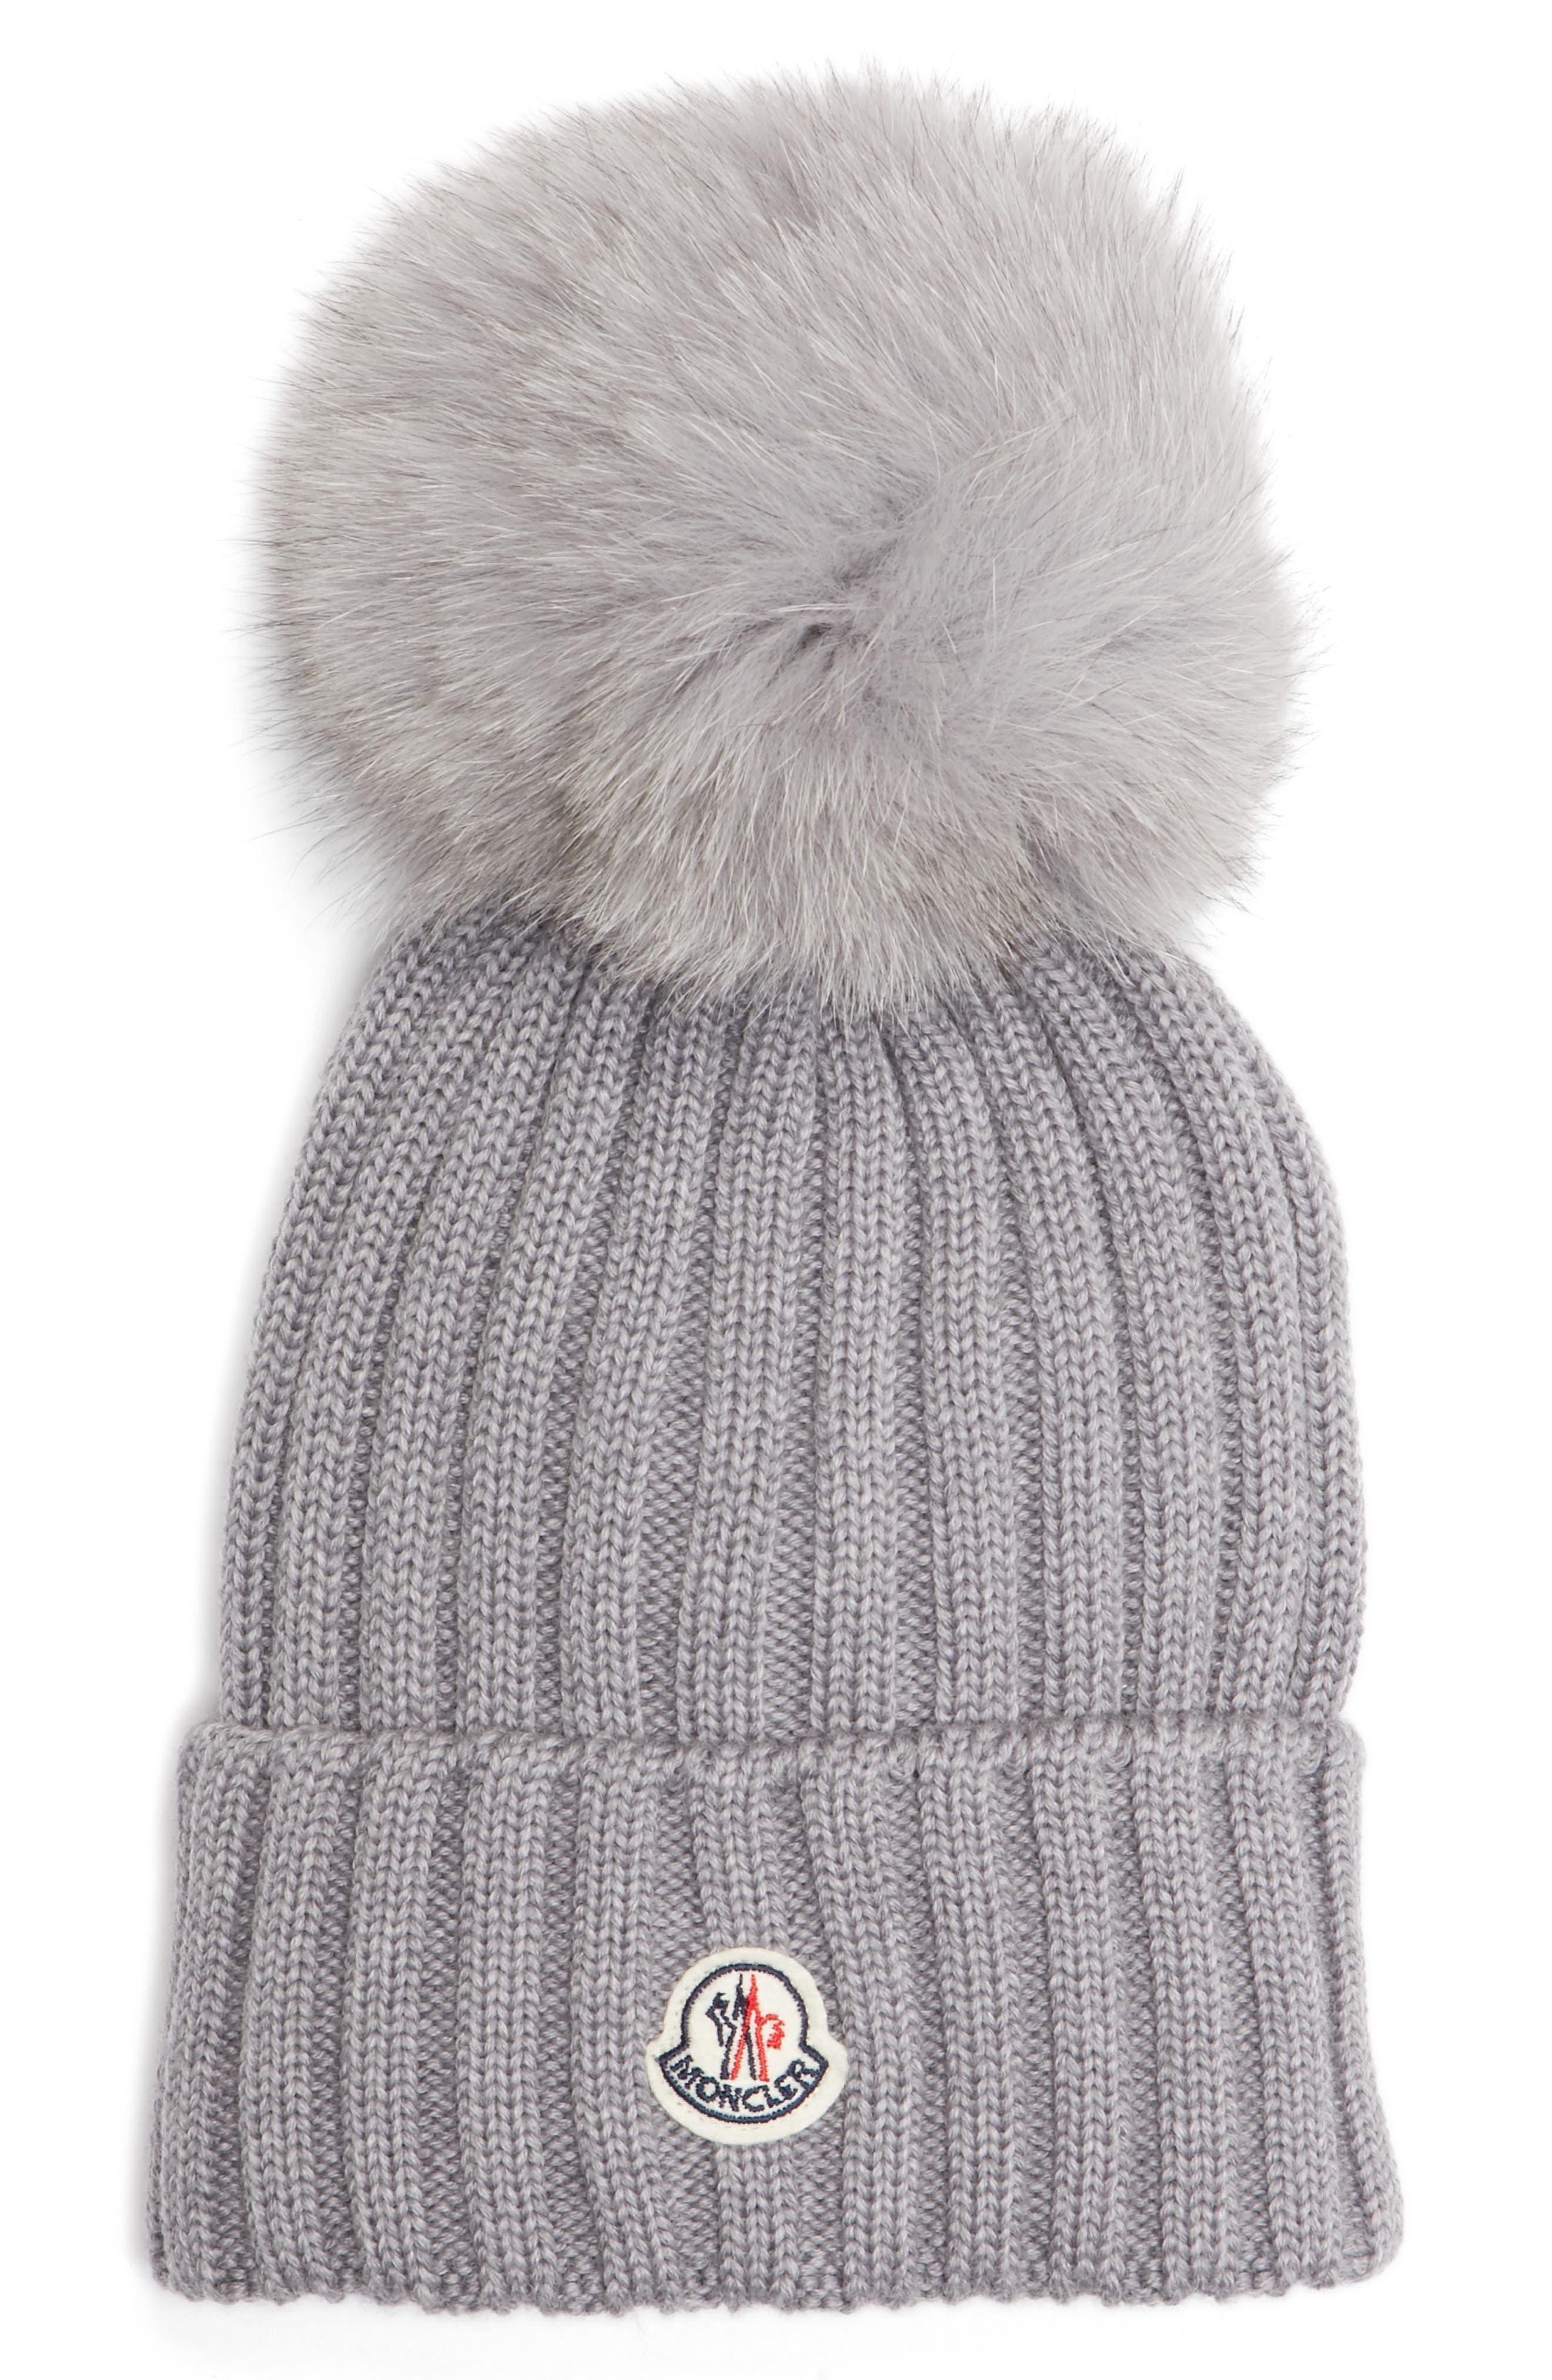 Main Image - Moncler Genuine Fox Fur Pom Ribbed Wool Beanie